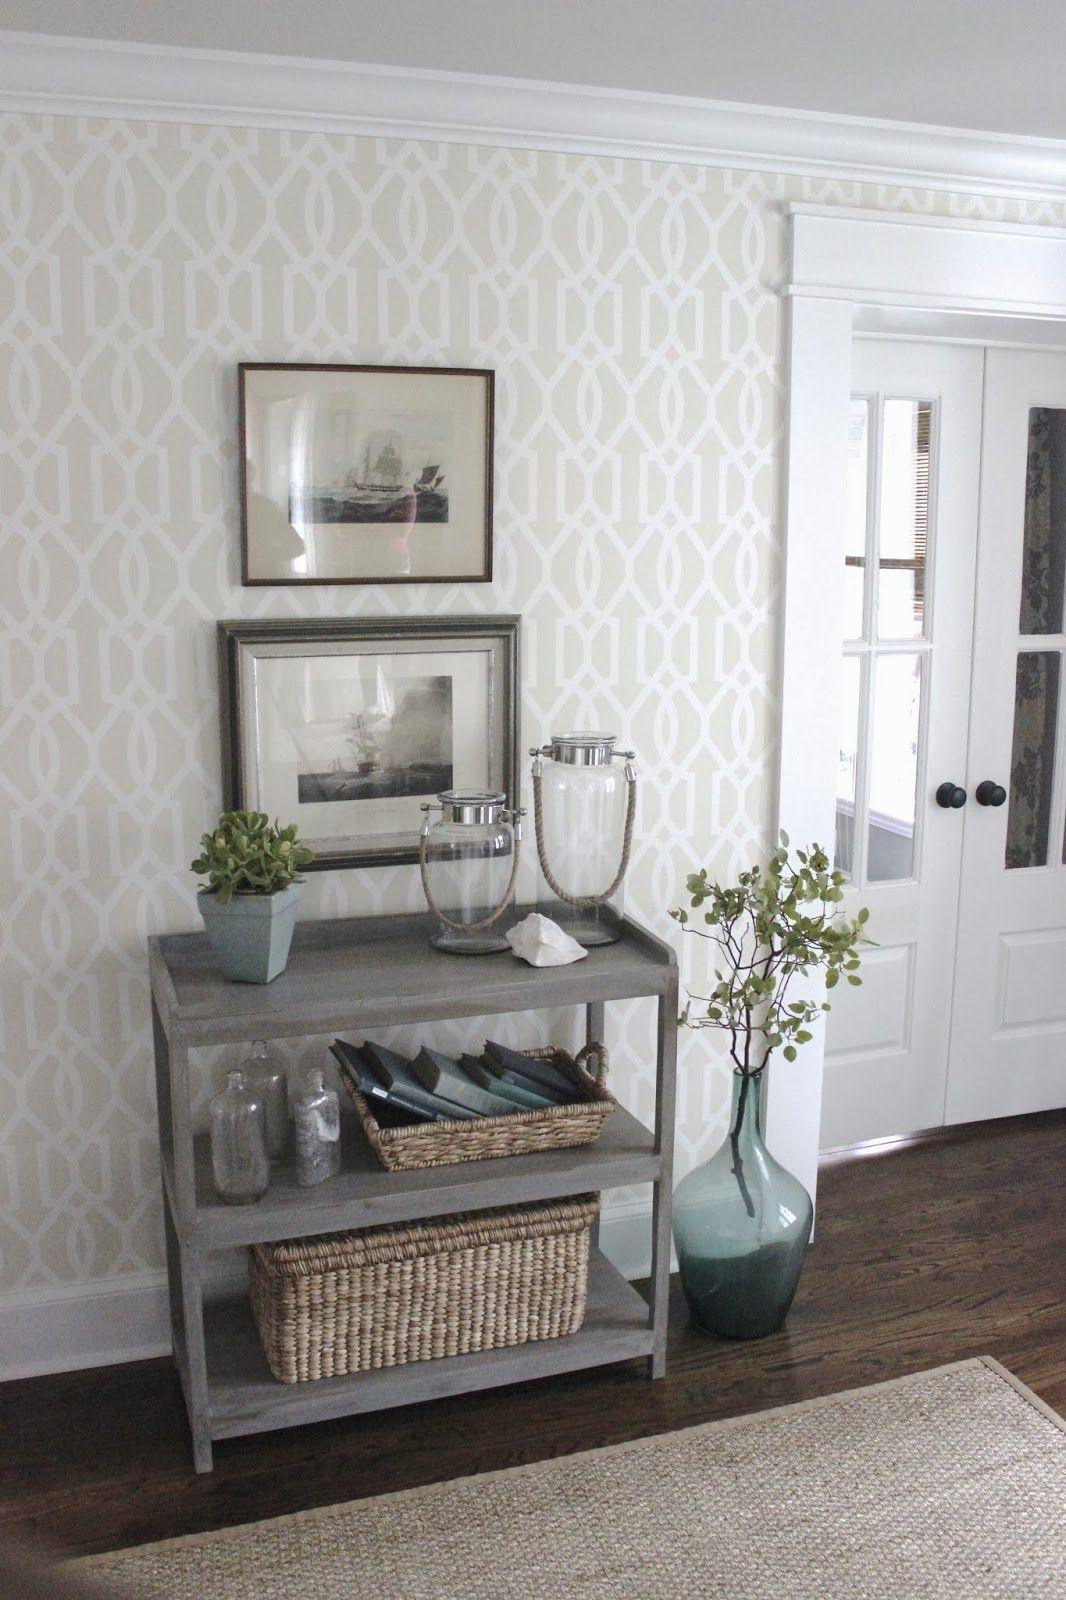 28 Wallpaper Decorating Ideas Living Room 2021 In 2020 Wallpaper Living Room Home Home Decor